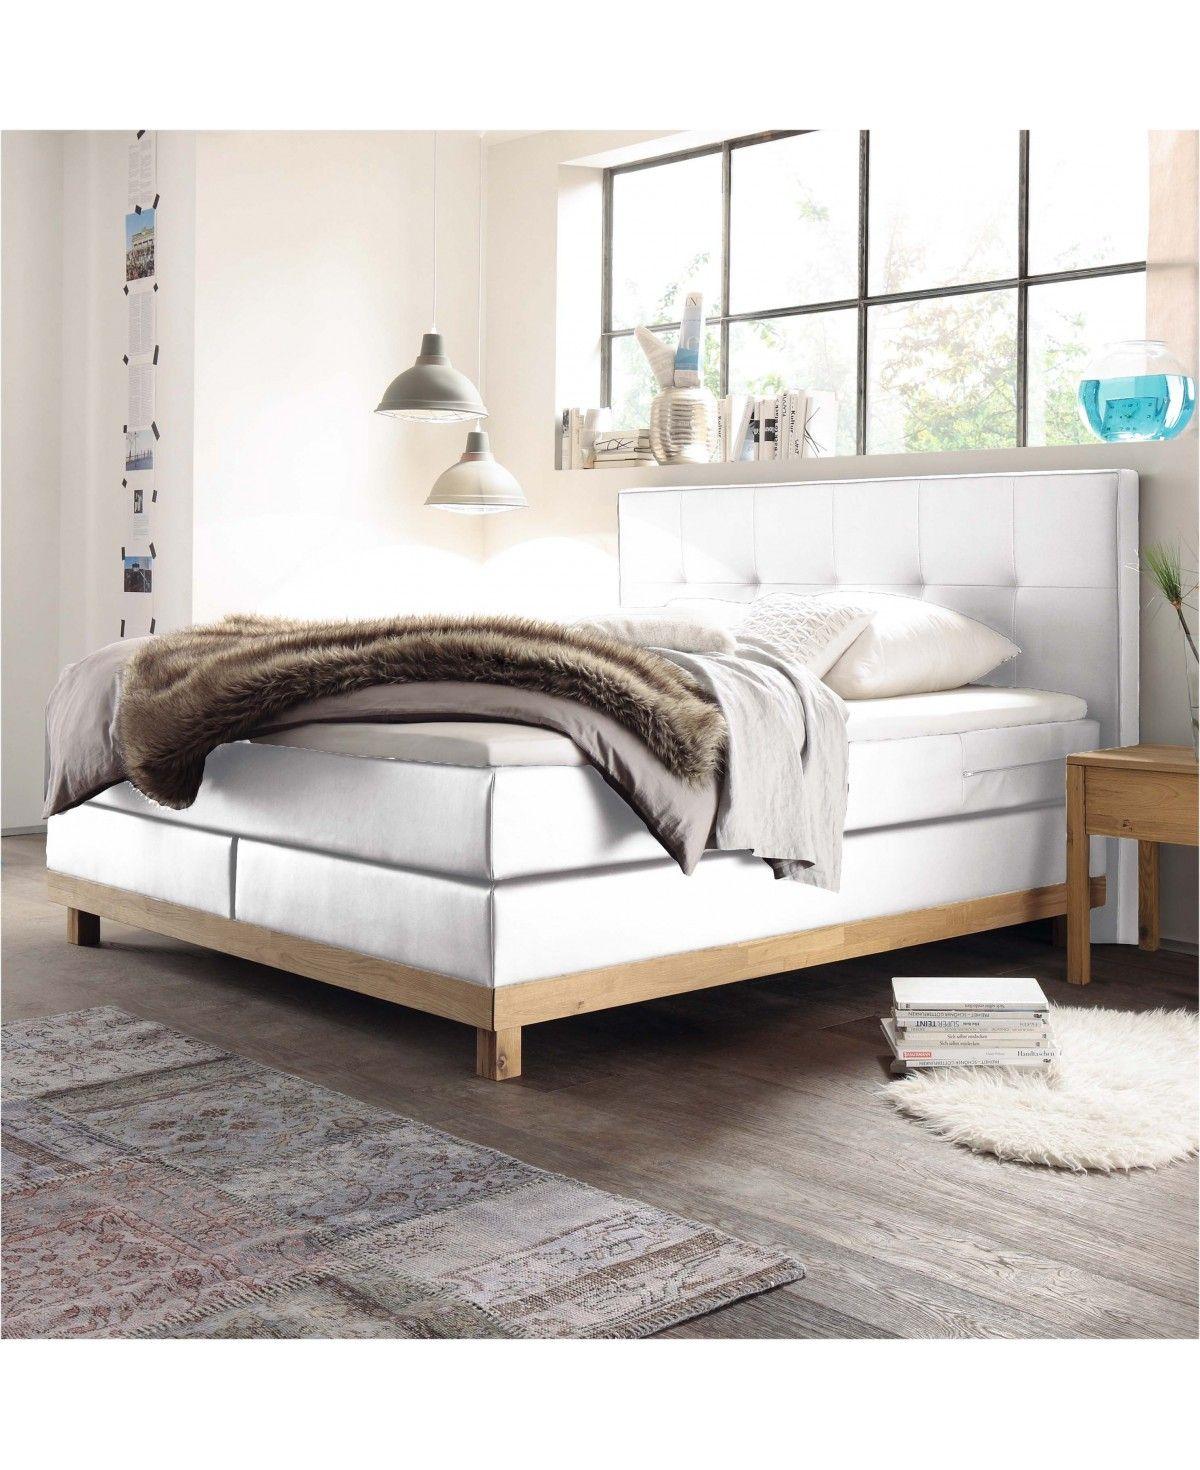 hasena boxspringbett bella eiche bianco kunstleder wei. Black Bedroom Furniture Sets. Home Design Ideas